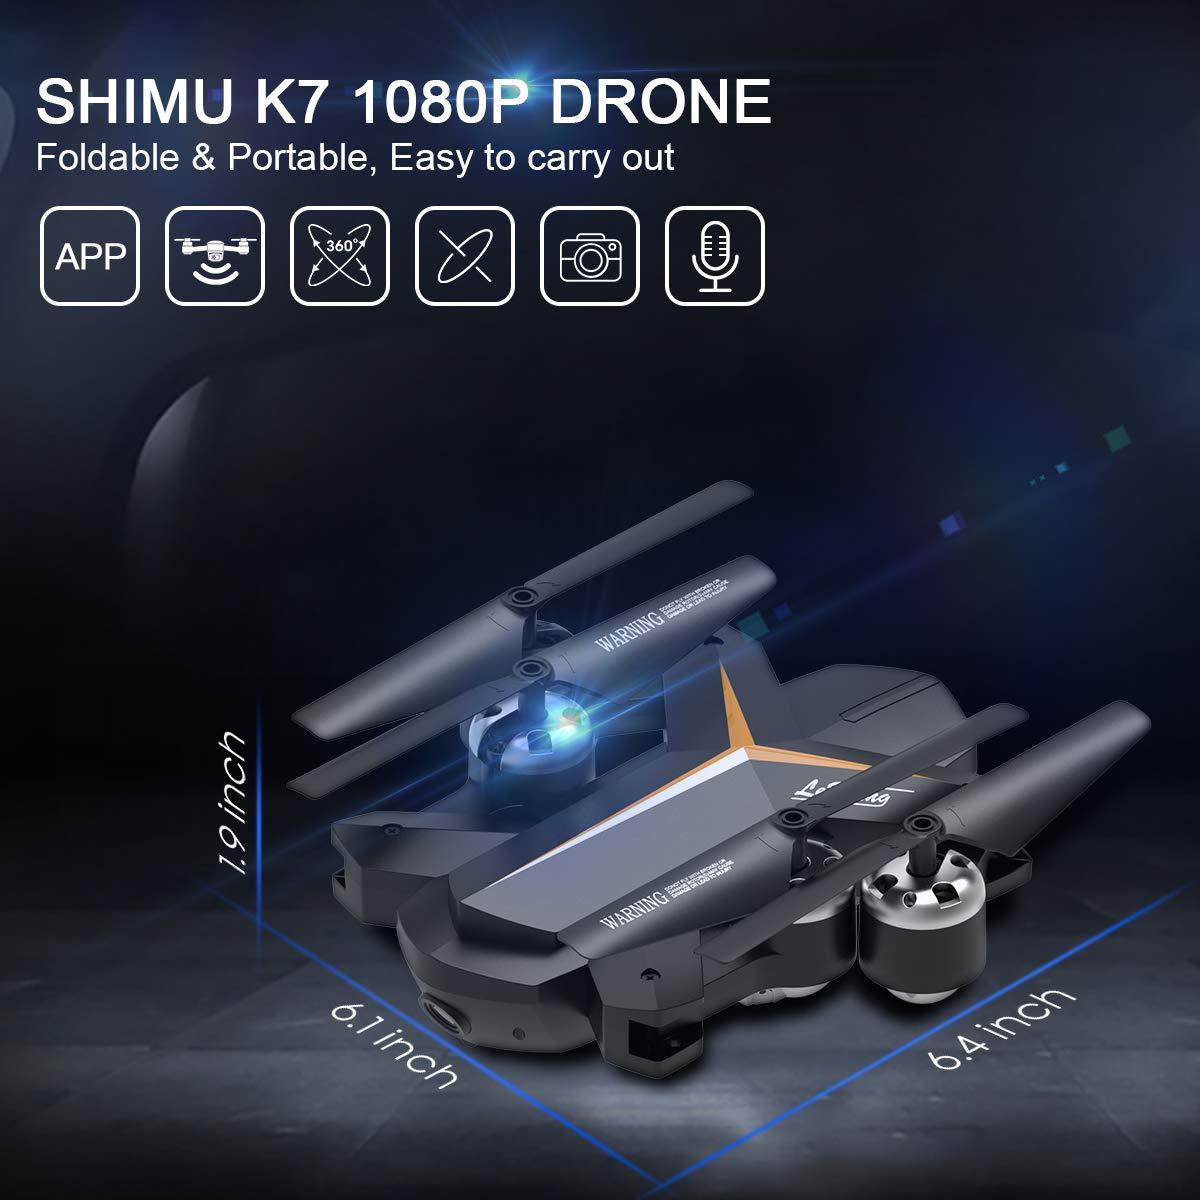 Shimu K7 Small Foldable Drone